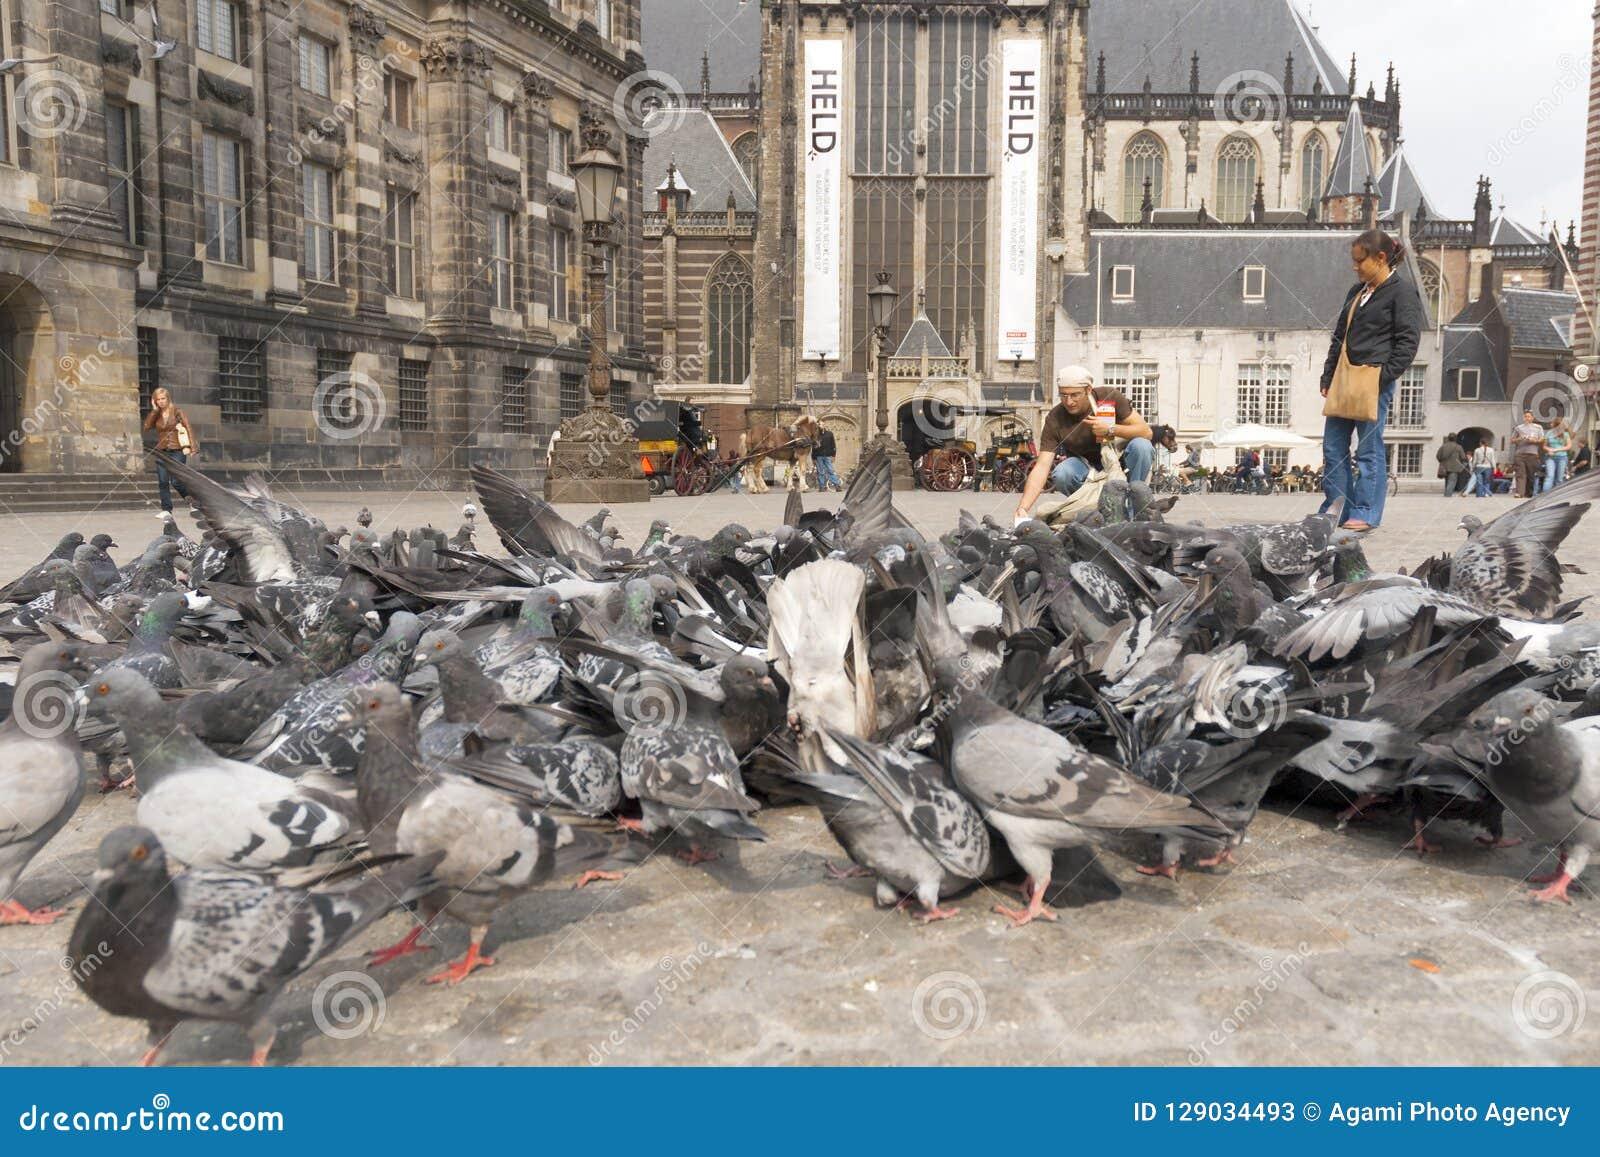 Stadsduif, Feral Pigeon, colomba livia